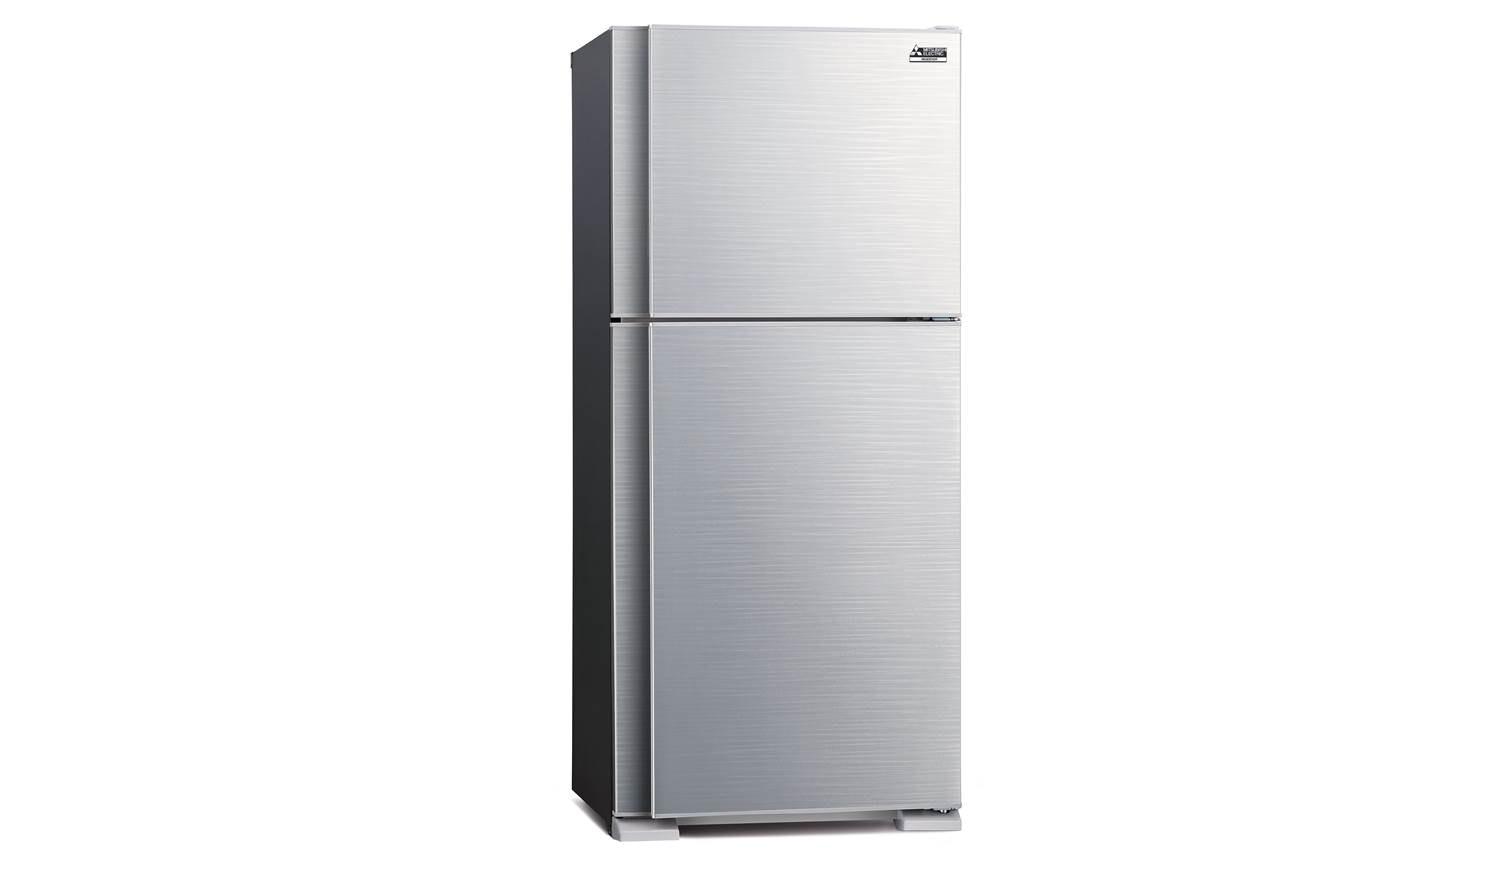 mitsubishi mr f42eg slw p 2 door refrigerator silver